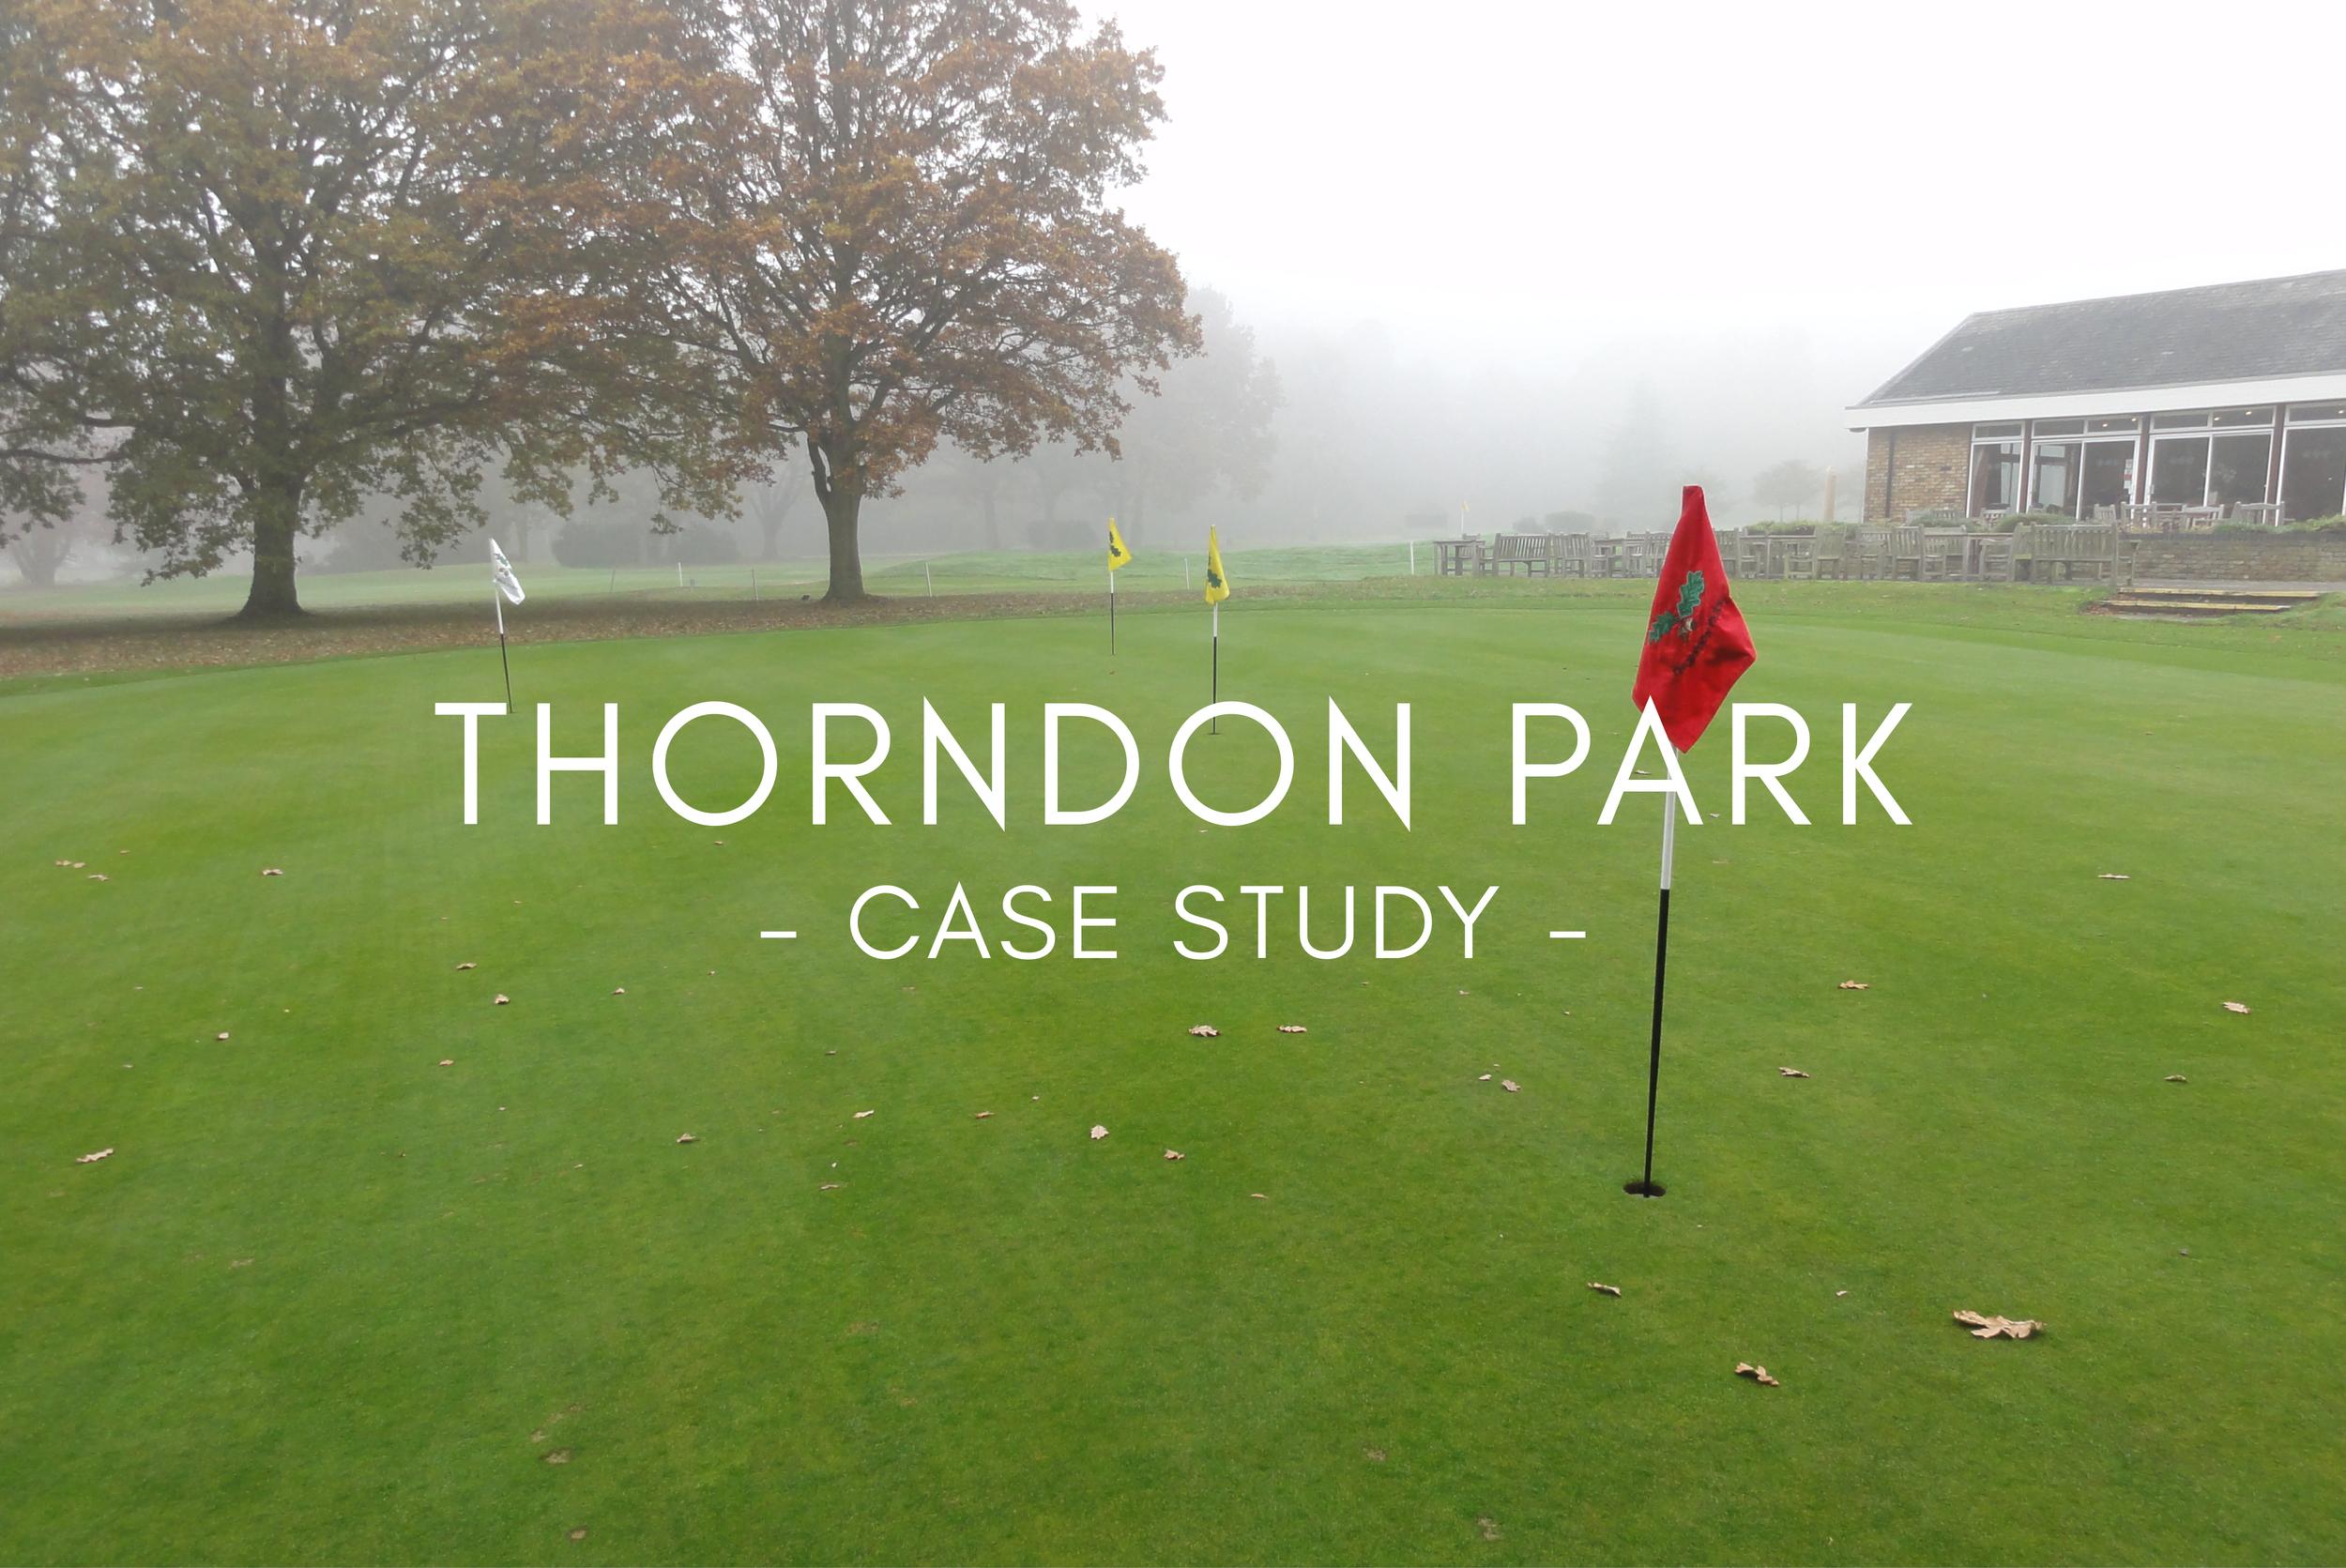 Thorndon Park - Case Study